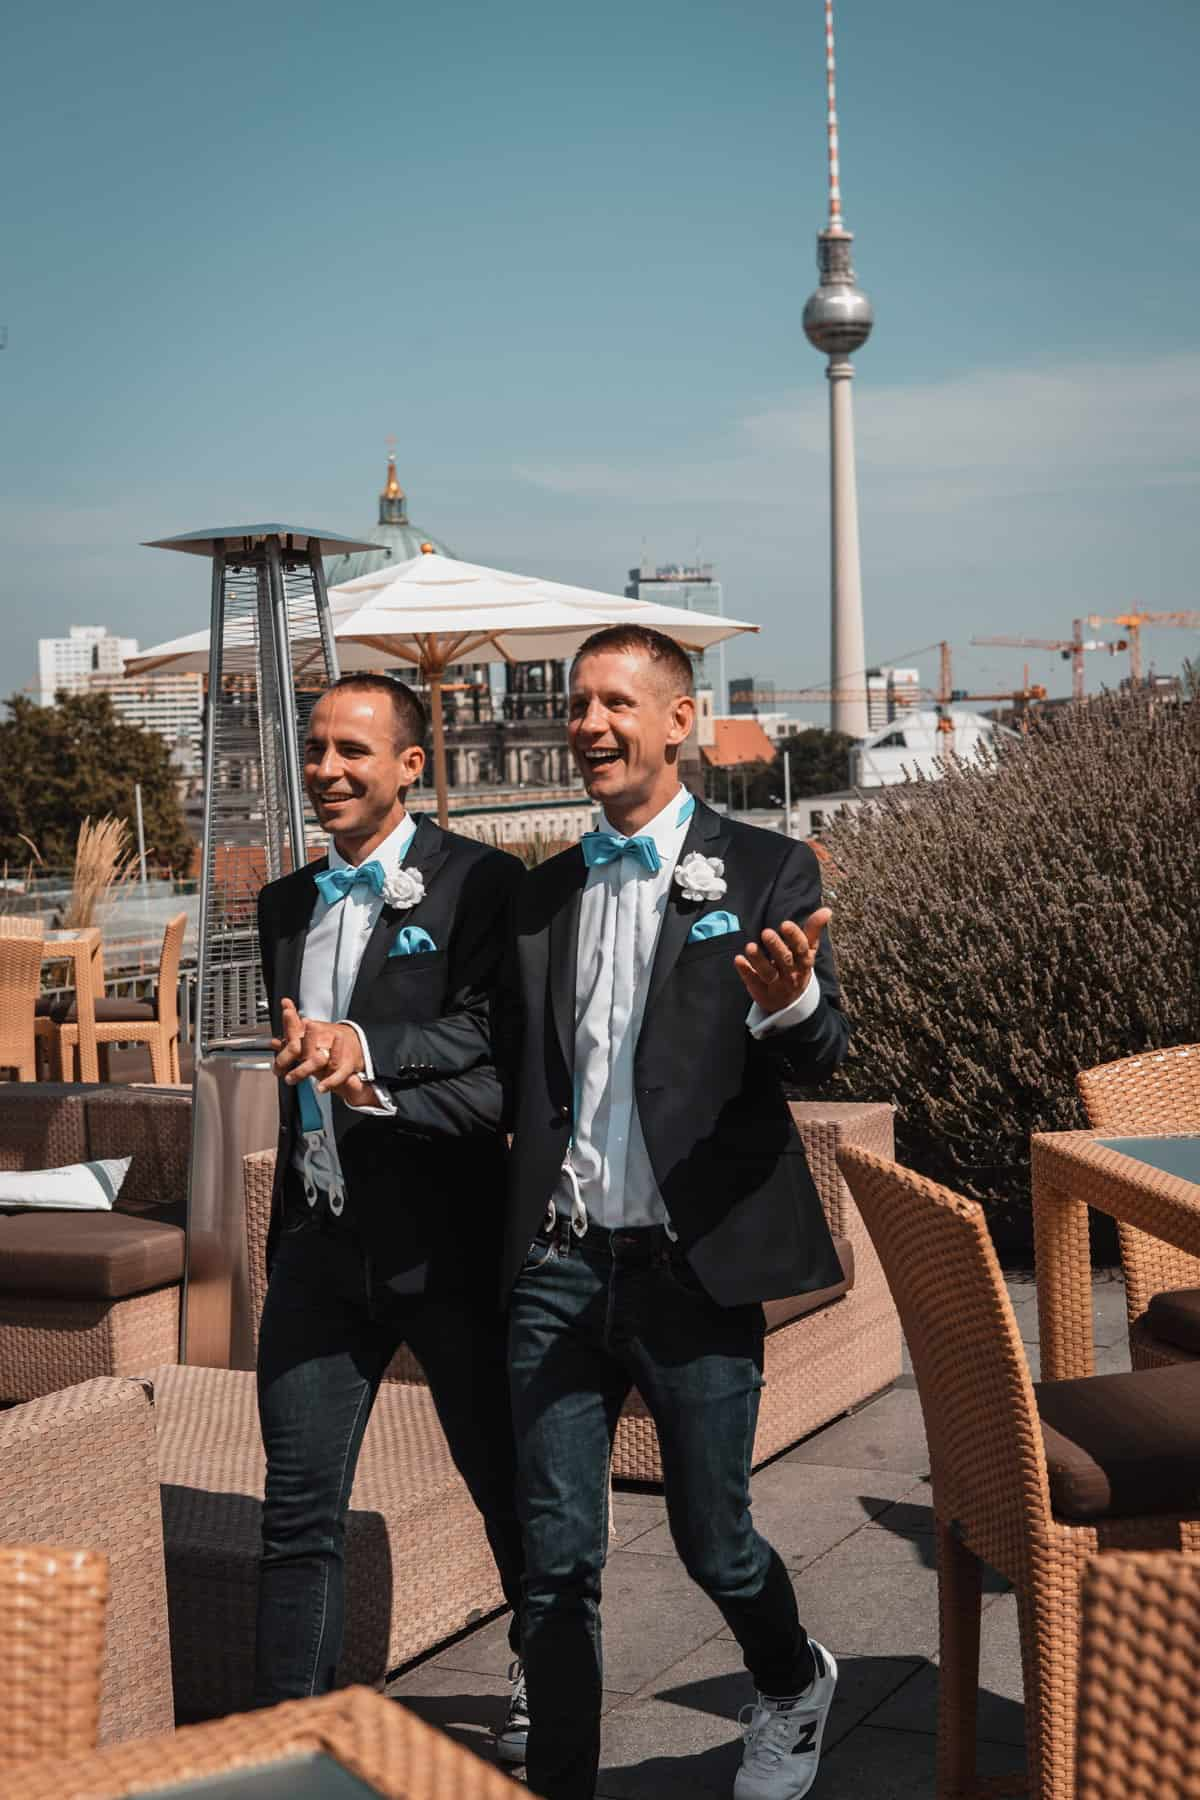 Hotel de Rome Hochzeitsfotografie (1)